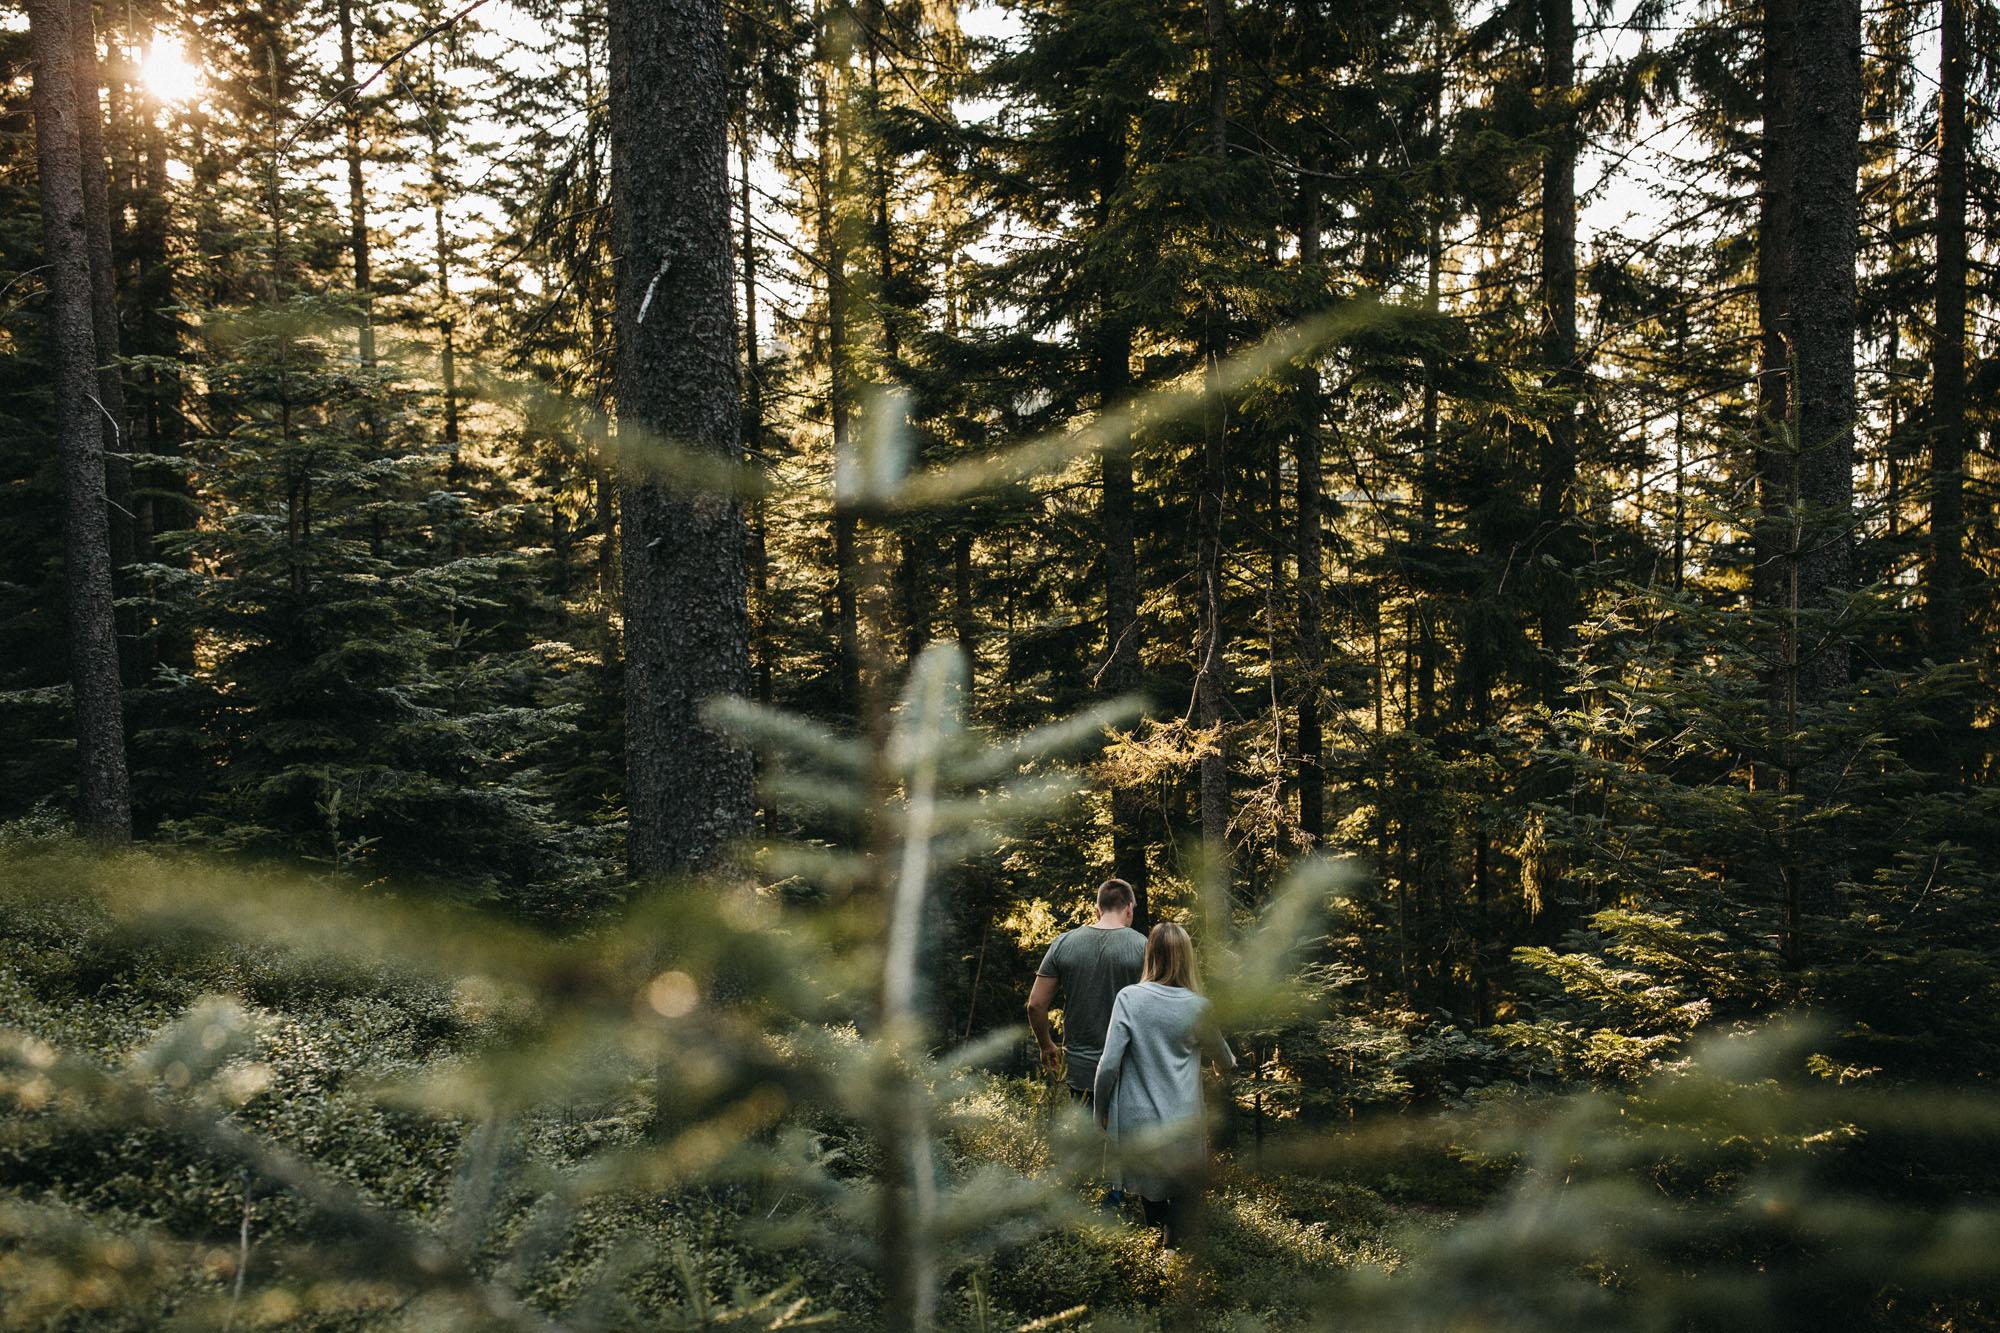 raissa simon photography hannah sven paar schwarzwald hornberg 18 - Hannah + Sven